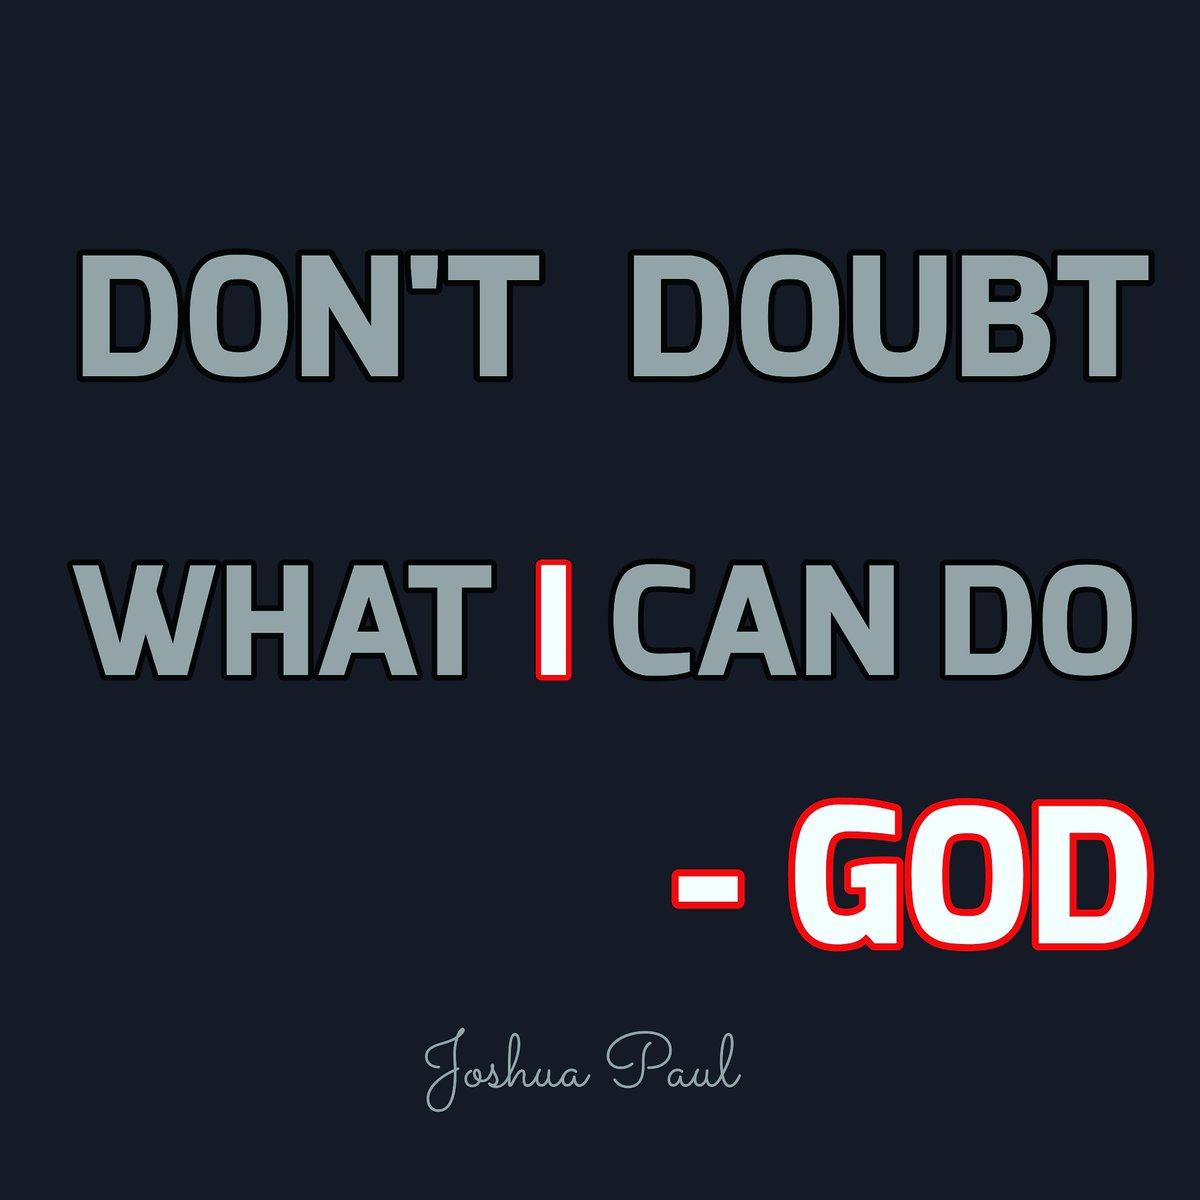 "DON'T DOUBT🤔 WHAT I CAN DO""                                                   -GOD #christianity #christian #jesus #bible #god #faith #jesuschrist #church #love #christ #prayer #gospel #bibleverse #holyspirit #godisgood #pray #hope #truth #blessed #believe #scripture #worship"